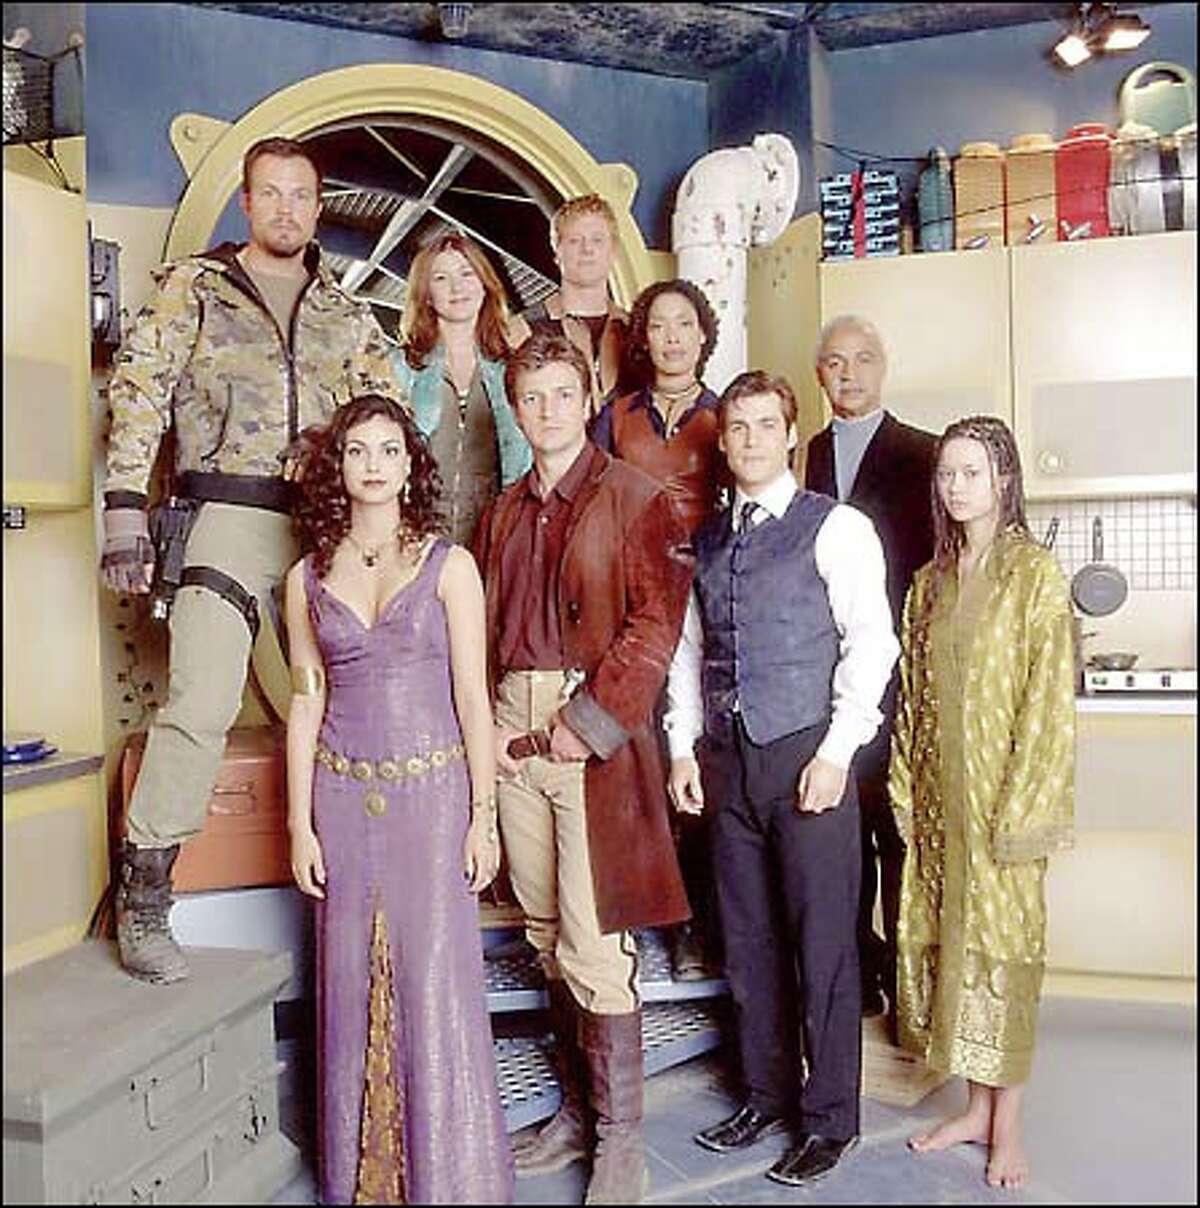 The alien-free cast of Joss Whedon's new